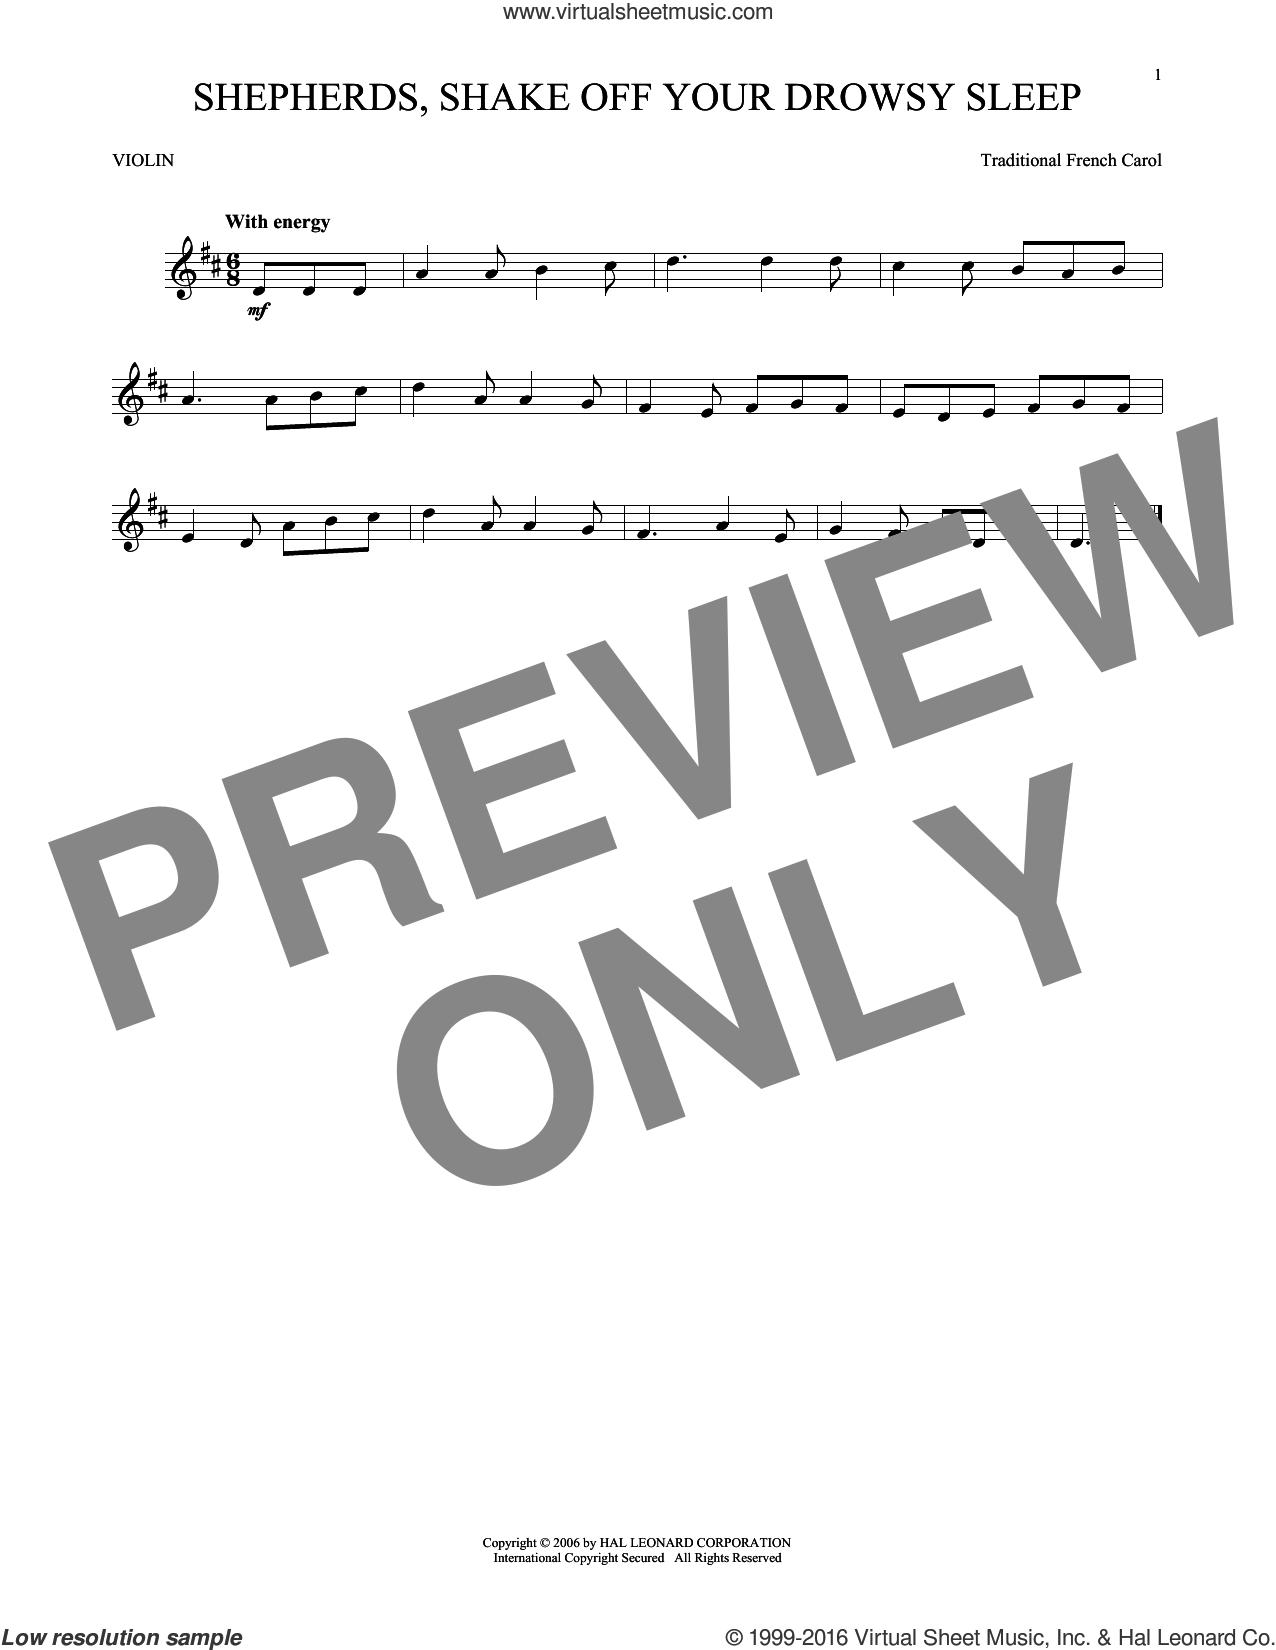 Shepherds, Shake Off Your Drowsy Sleep sheet music for violin solo, intermediate skill level